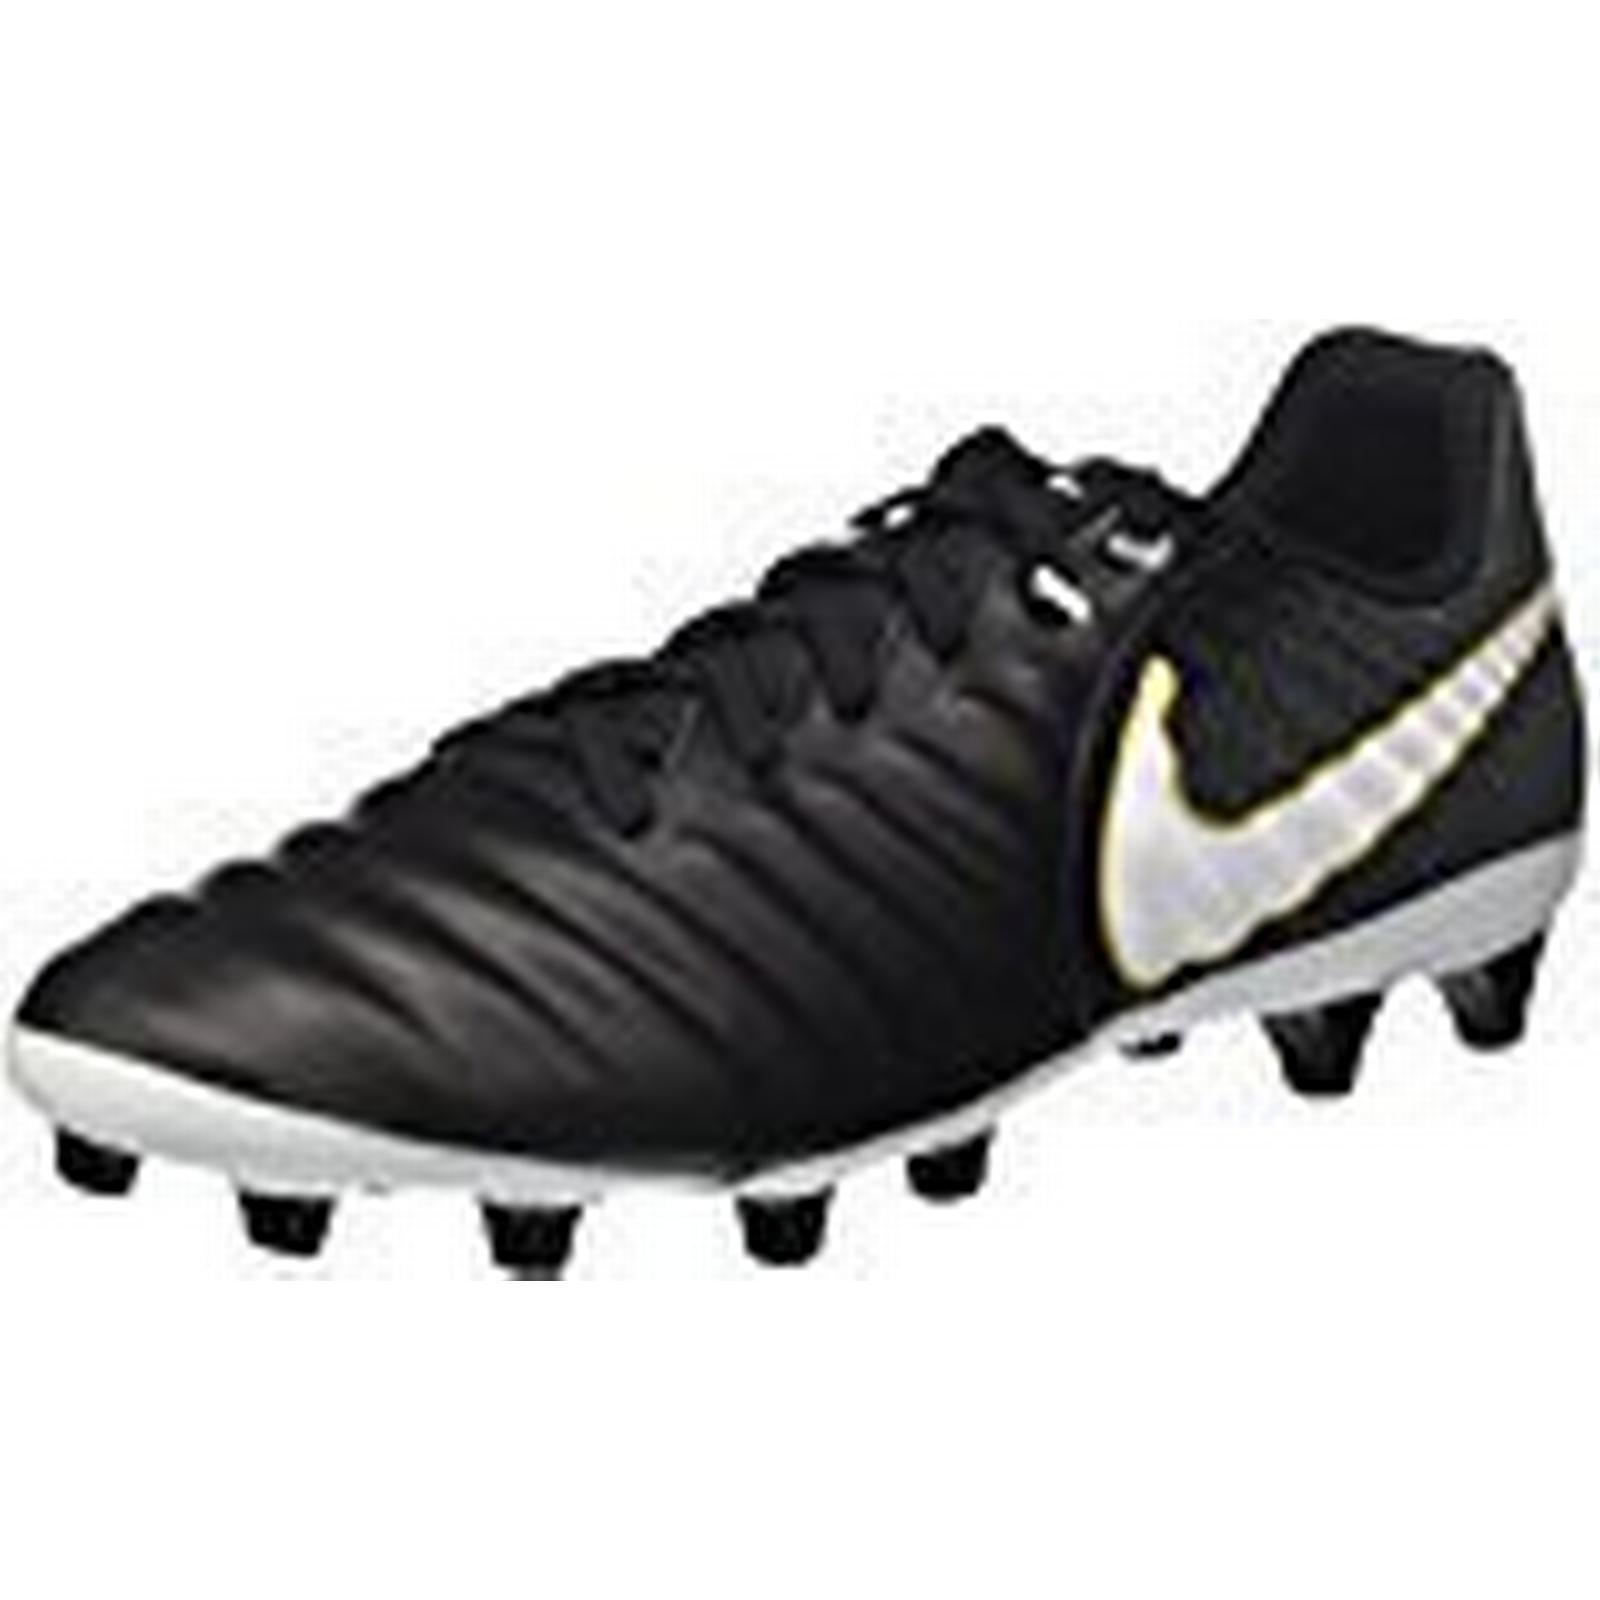 Nike Men's Tiempo Ligera Iv Ag-Pro Football Boots UK White/Black/Metallic Vivid Gold, 7 UK Boots 784045